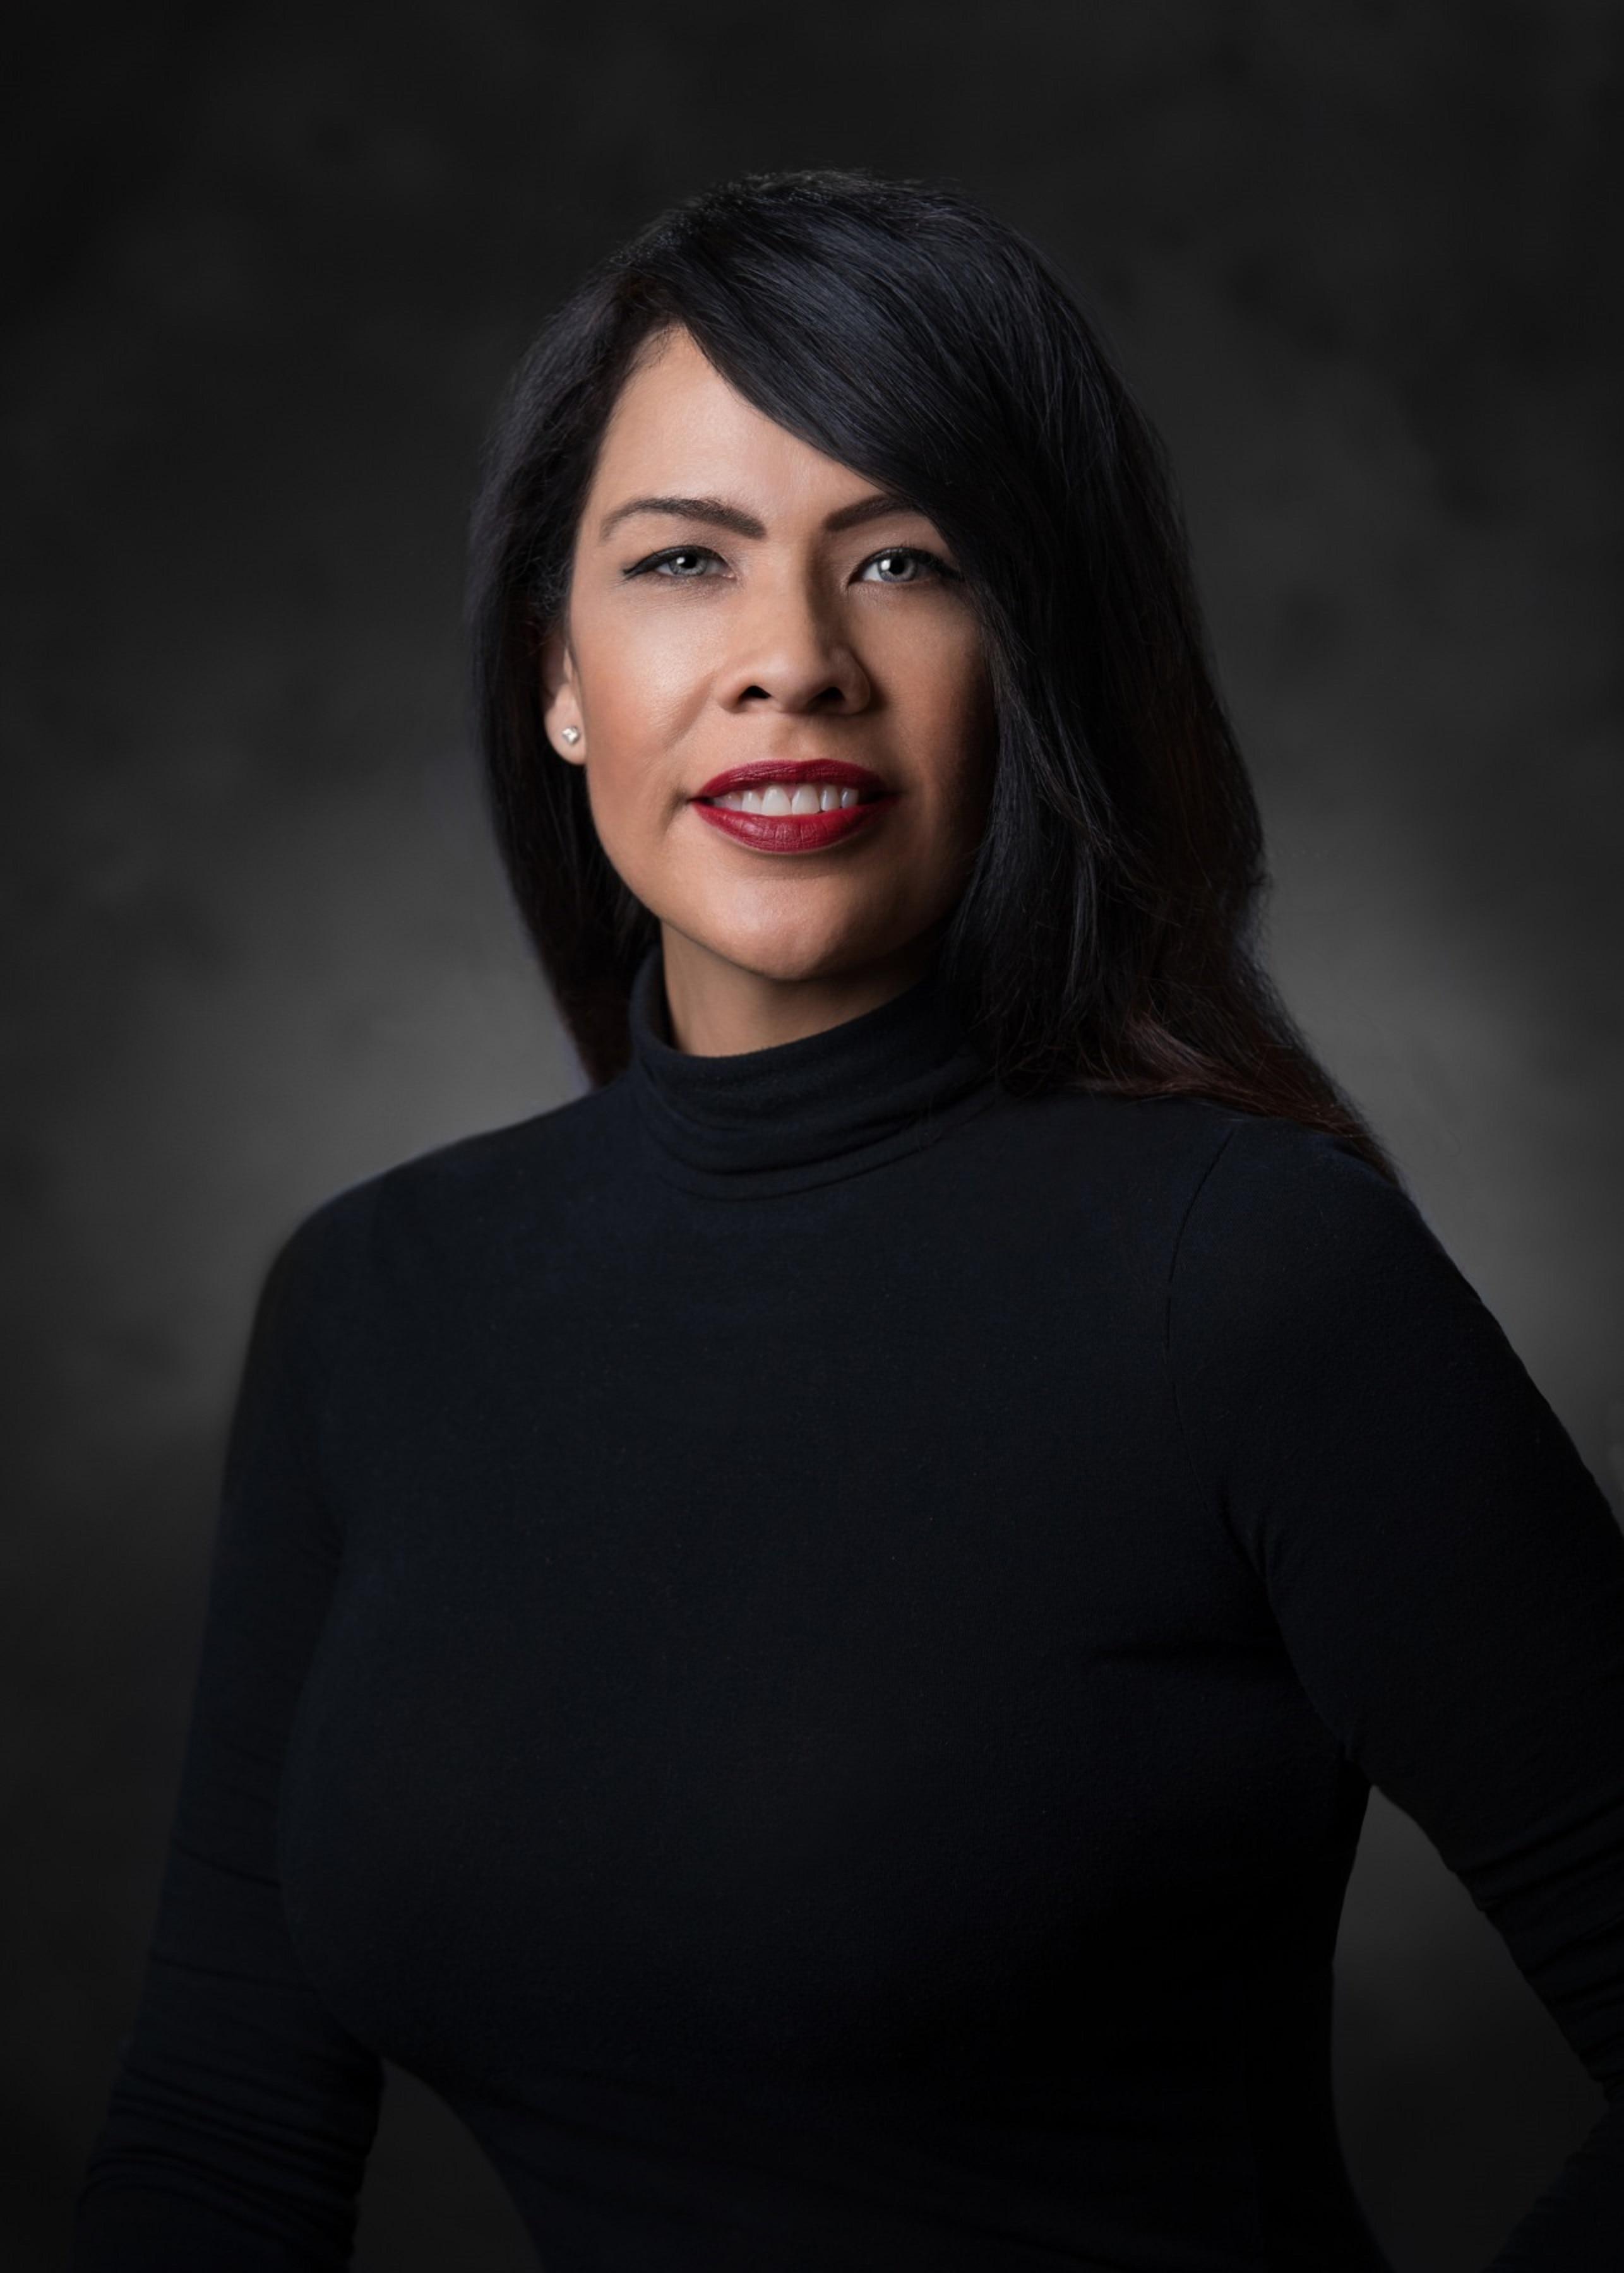 MICHELLE PADILLA JIMENEZ  Your Financial Professional & Insurance Agent